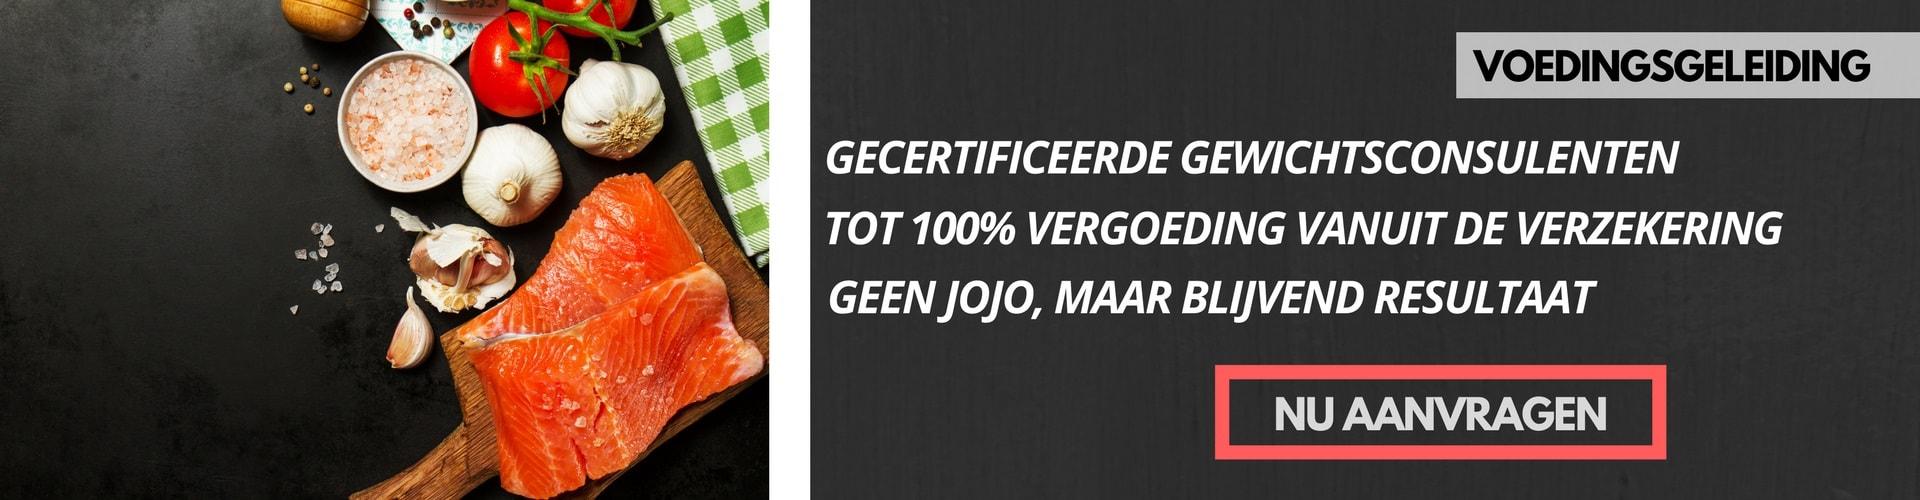 Voedingsbegeleiding Venlo